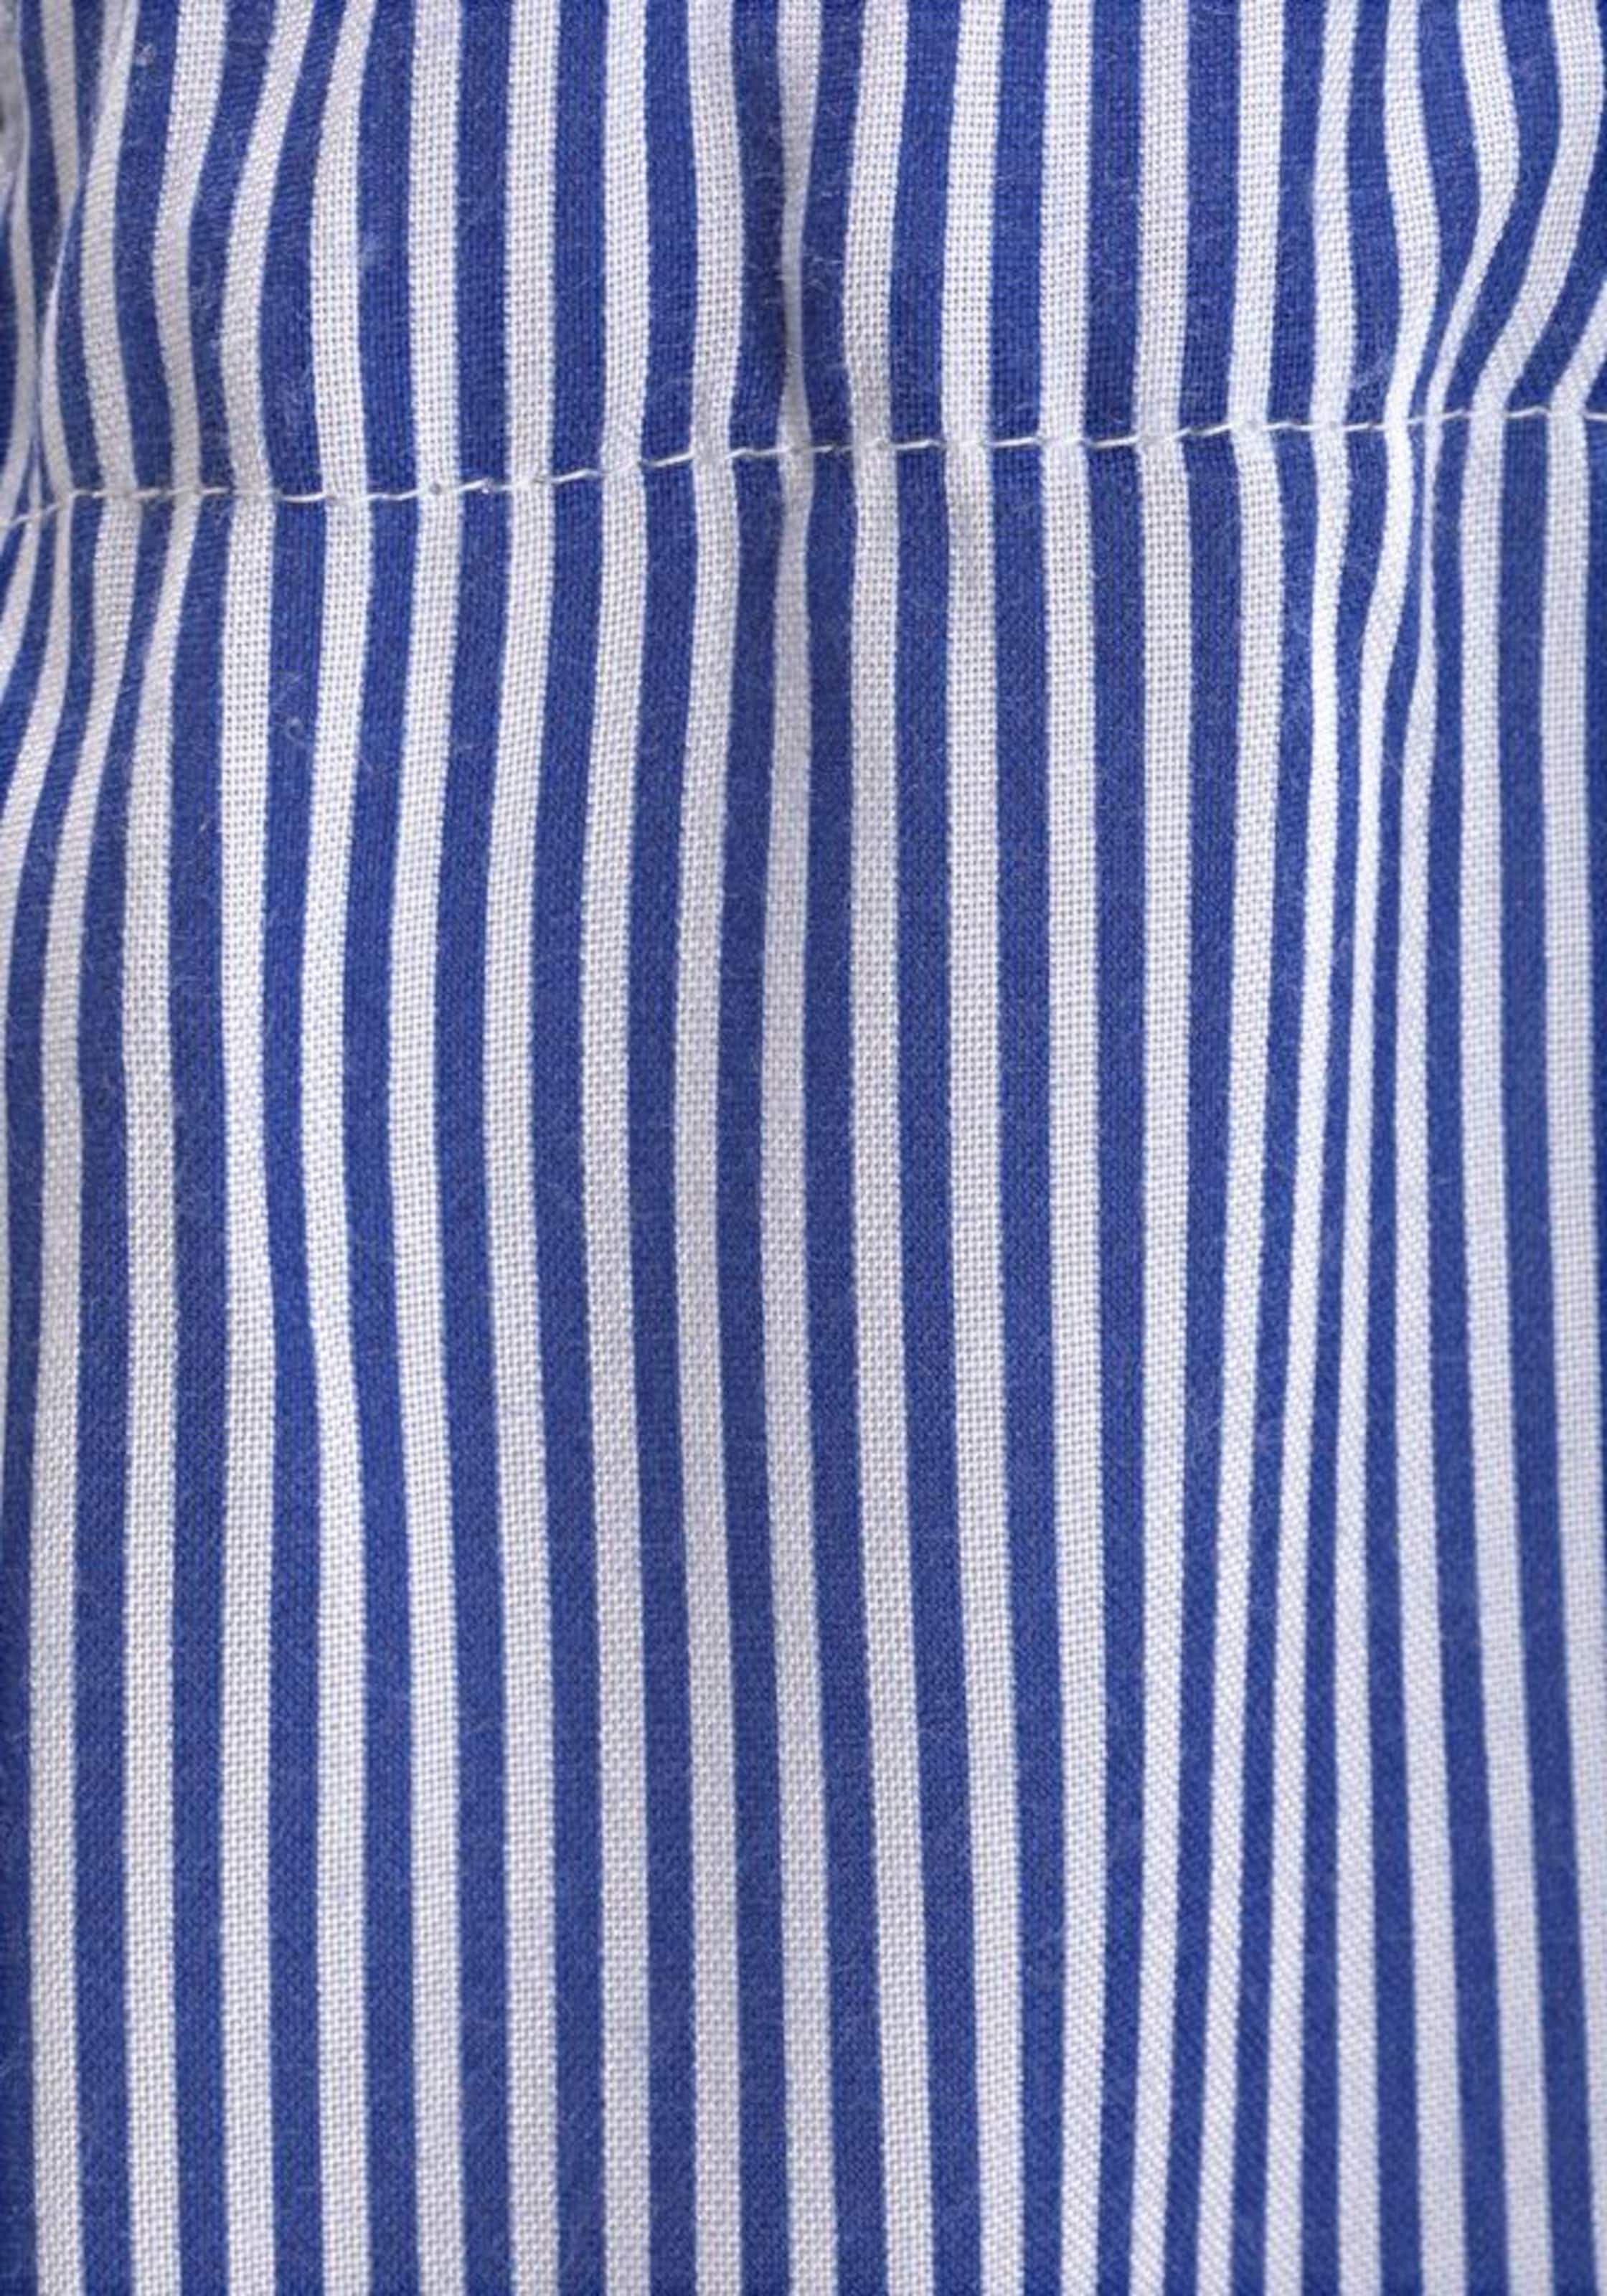 BlauWeiß Strandkleid Lascana Strandkleid BlauWeiß Lascana In Lascana In Strandkleid BlauWeiß Strandkleid In In Lascana tQrCshd